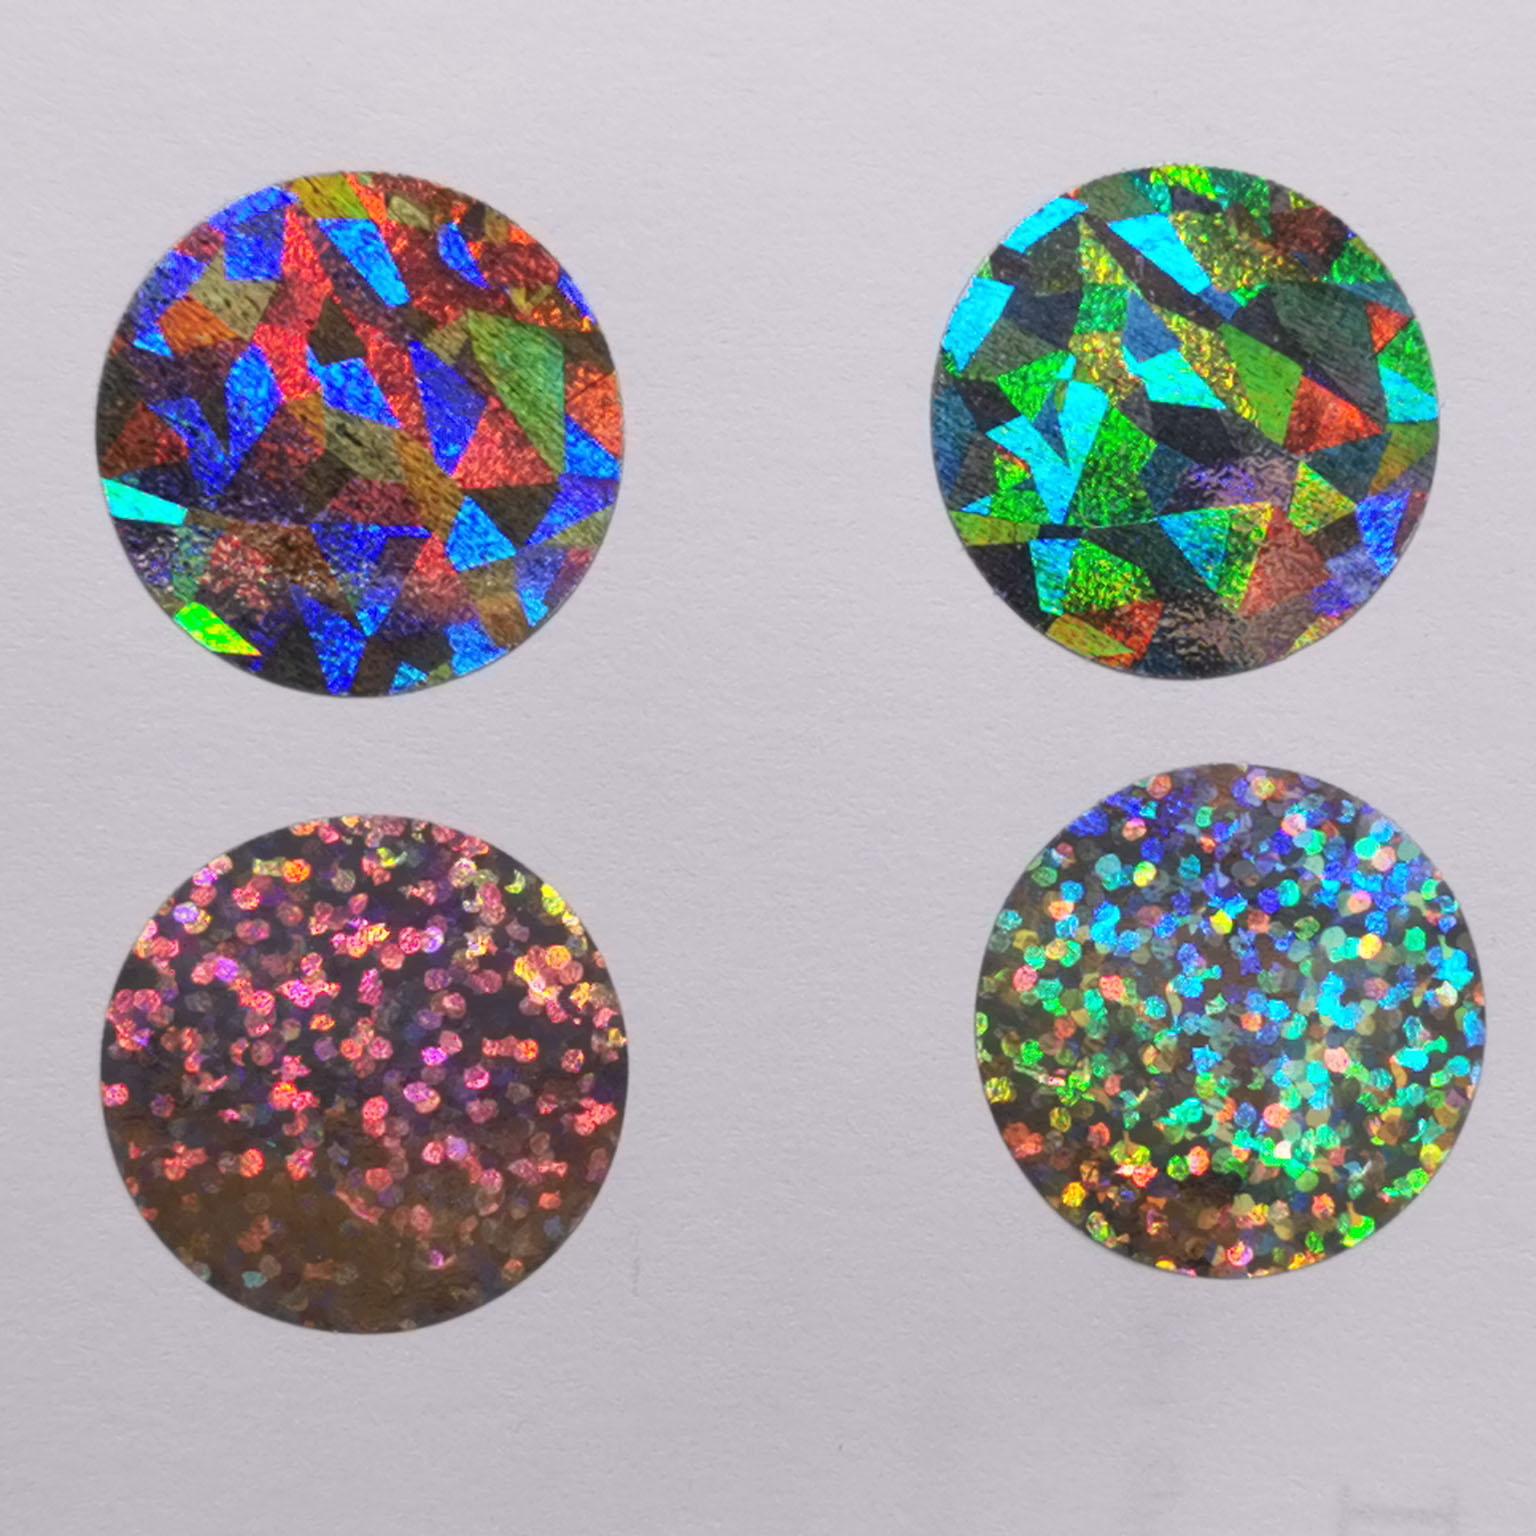 adesivos 25*25mm diamante laser cor metálico holograma